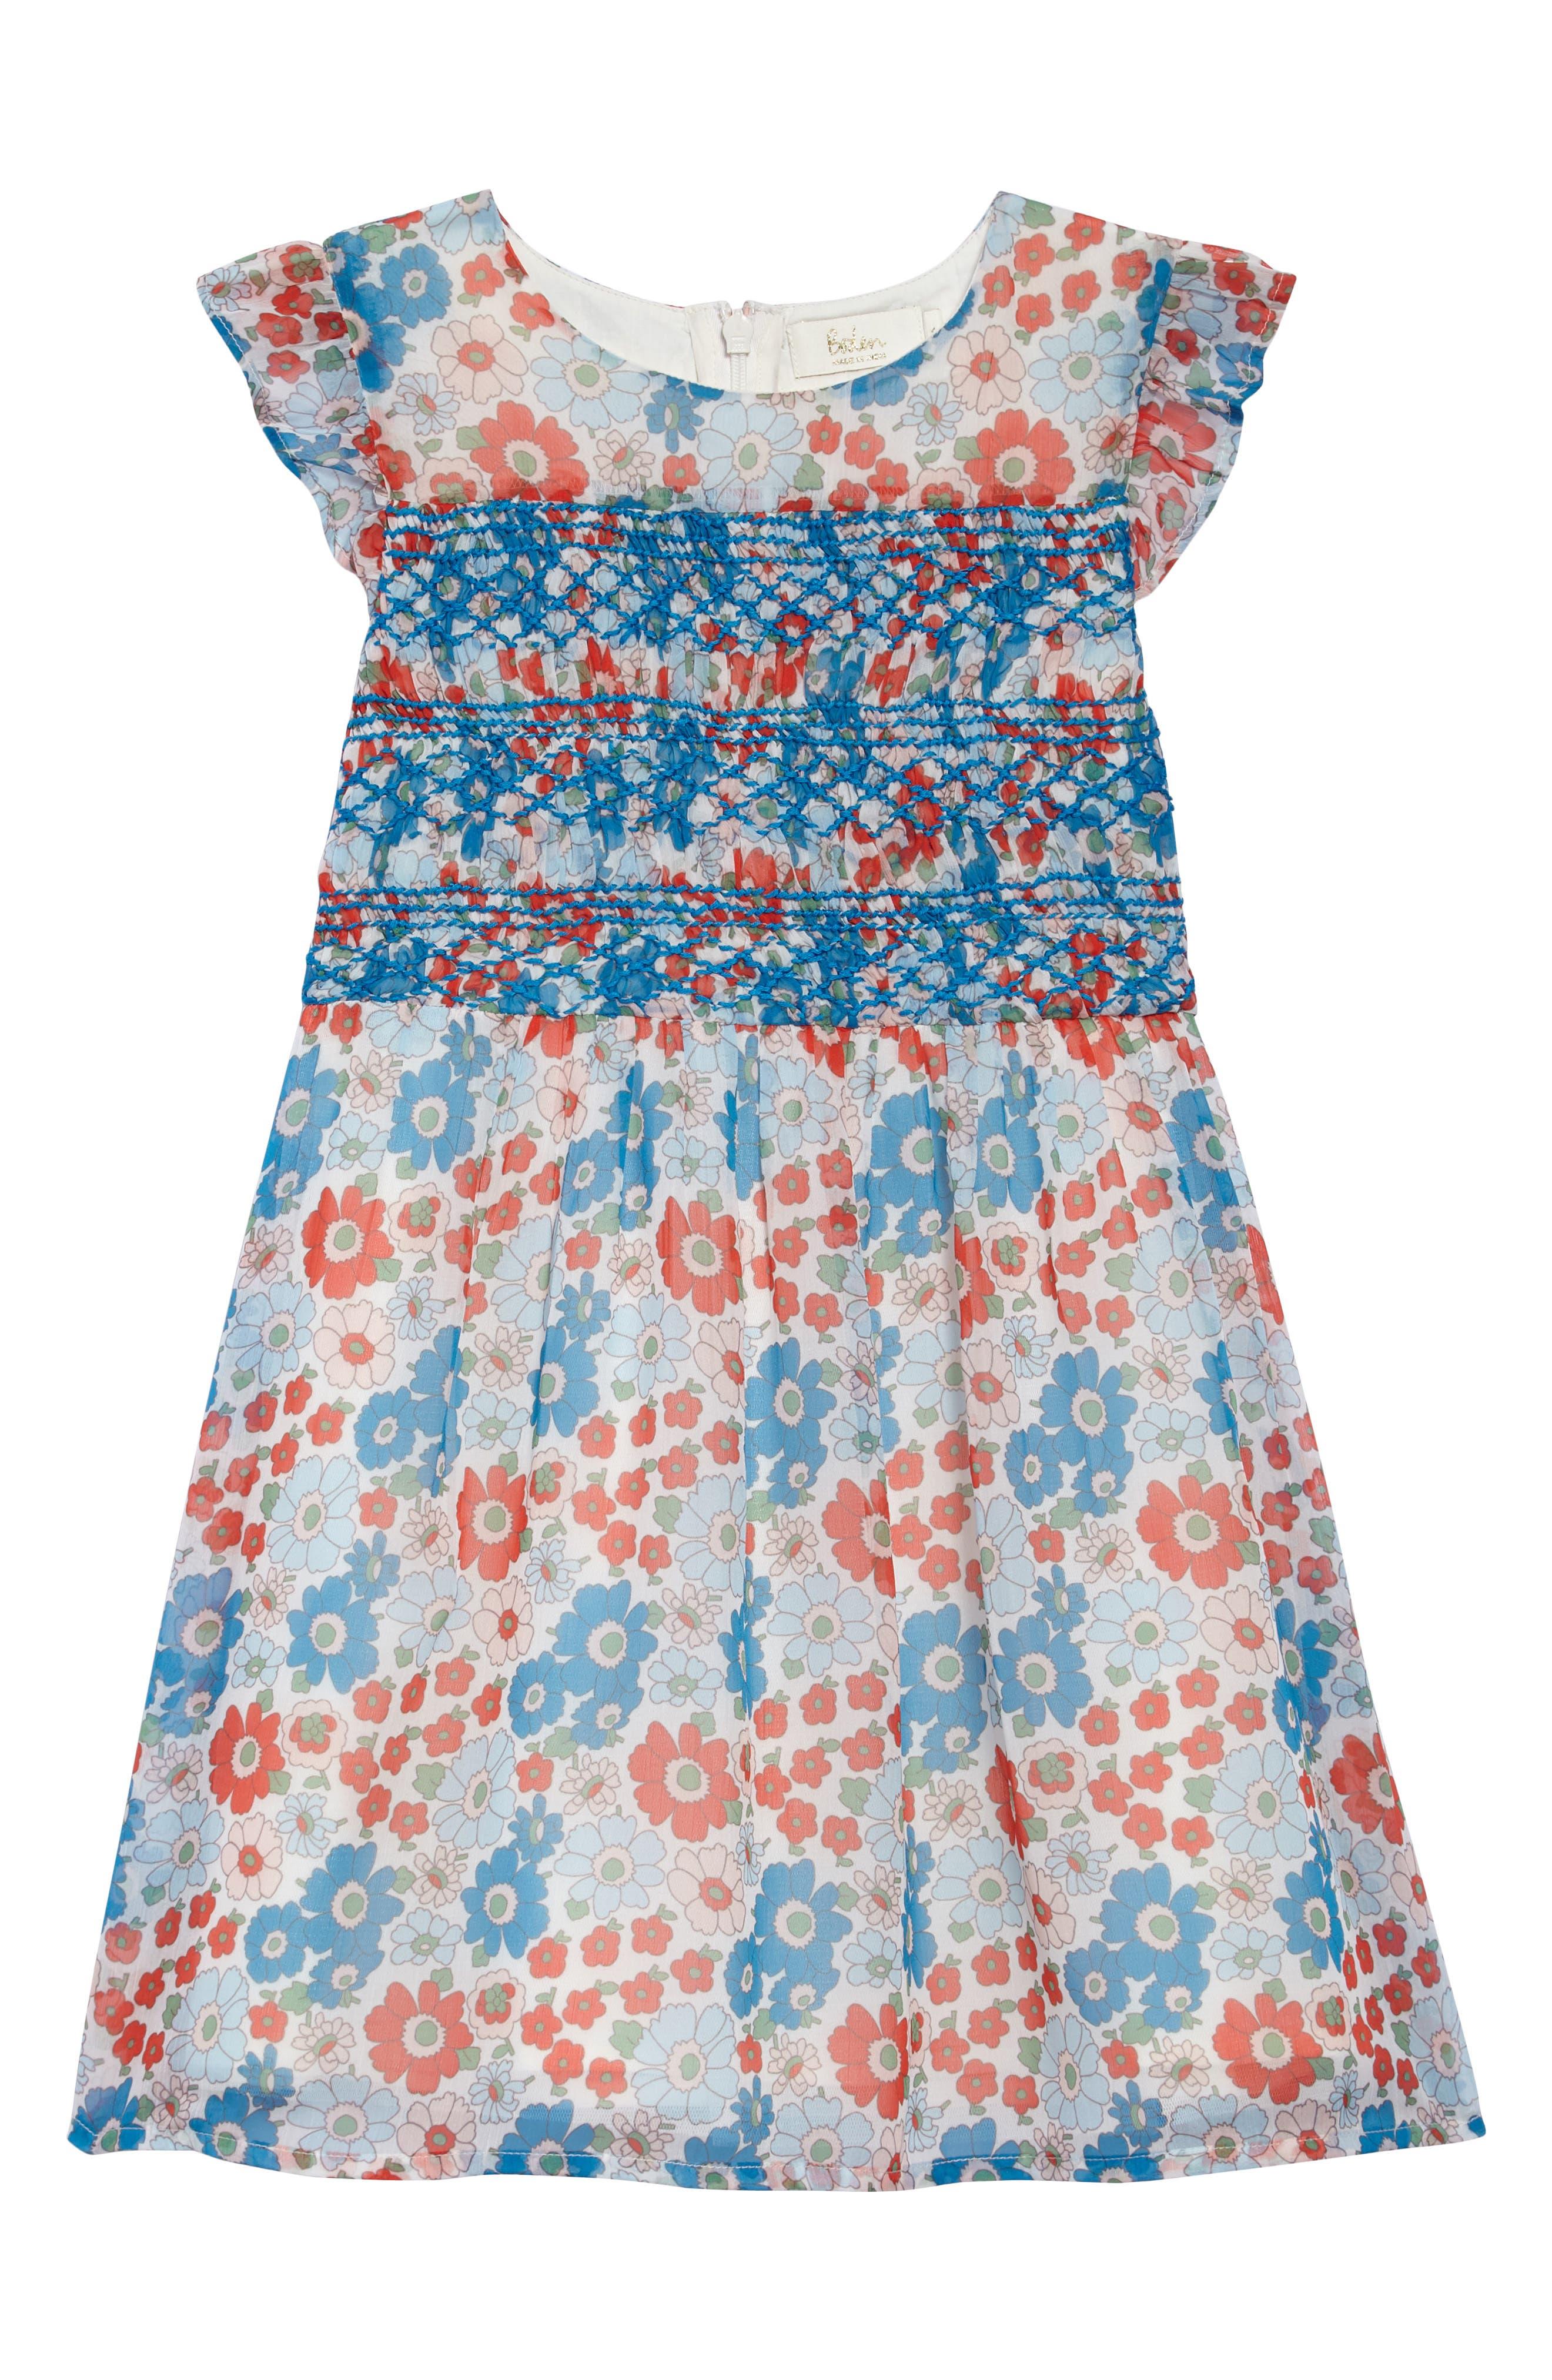 Floral Smocked Dress,                             Main thumbnail 1, color,                             901